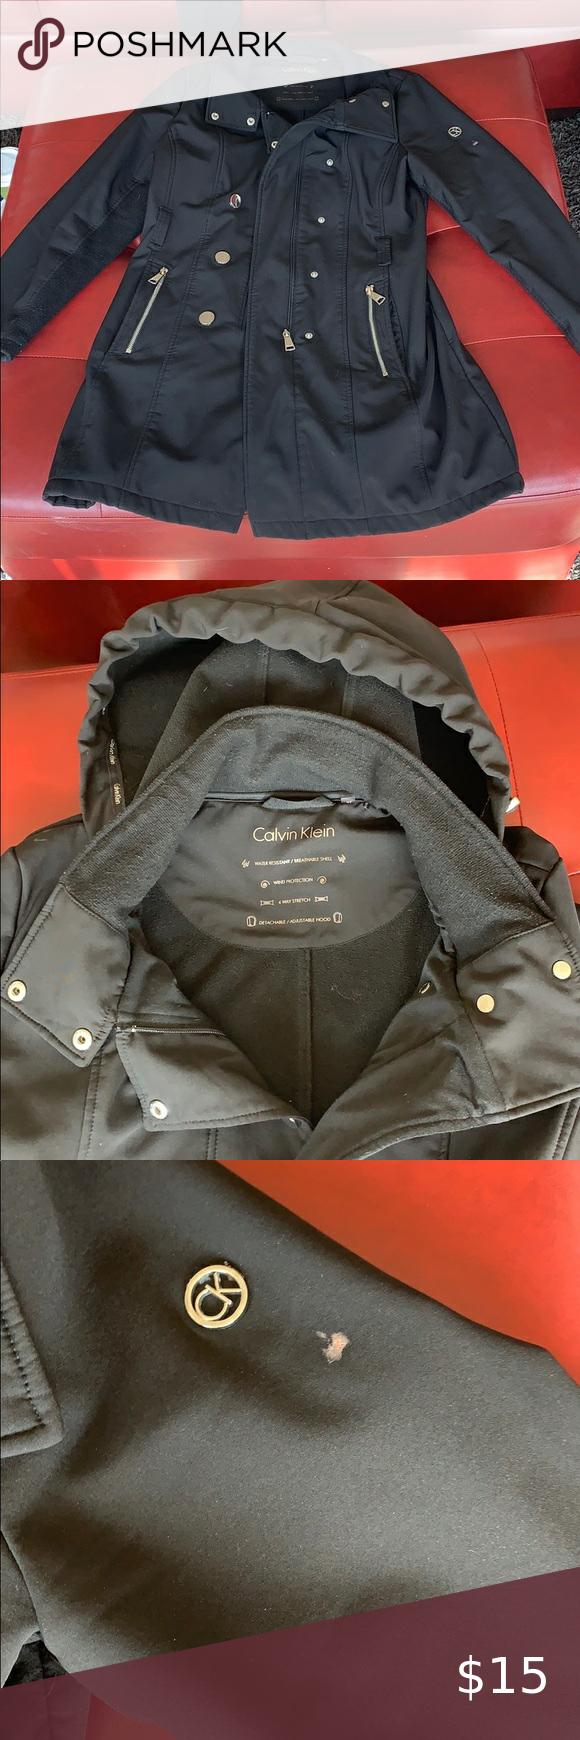 Calvin Klein Coat Vintage Denim Jacket Mens Leather Coats Calvin Klein Vest [ 1740 x 580 Pixel ]